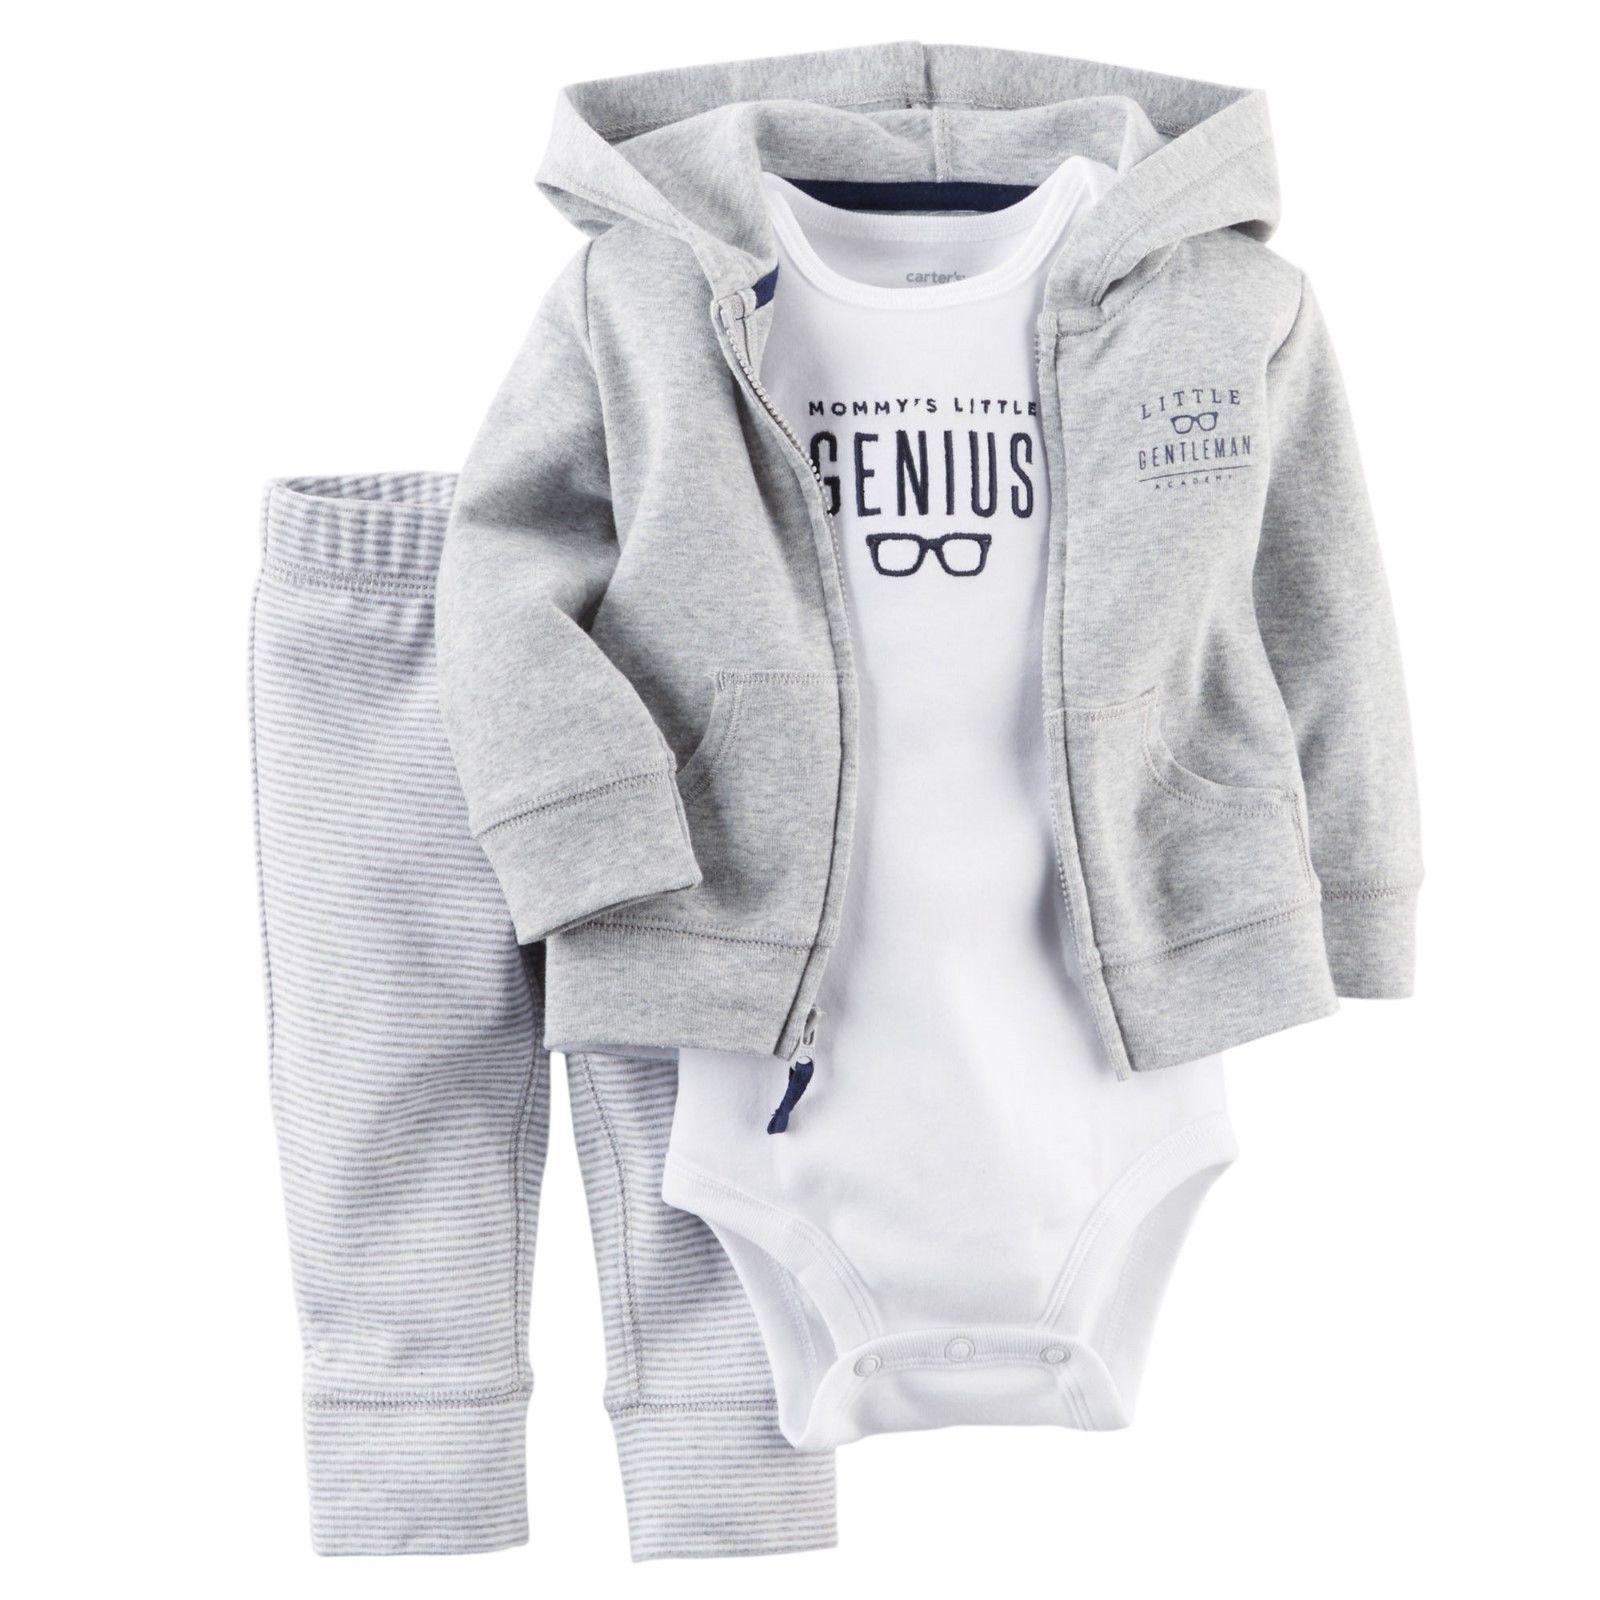 2017 Latest Casual Newborn 6 9 12 18 Months Cardigan Pants Set Baby